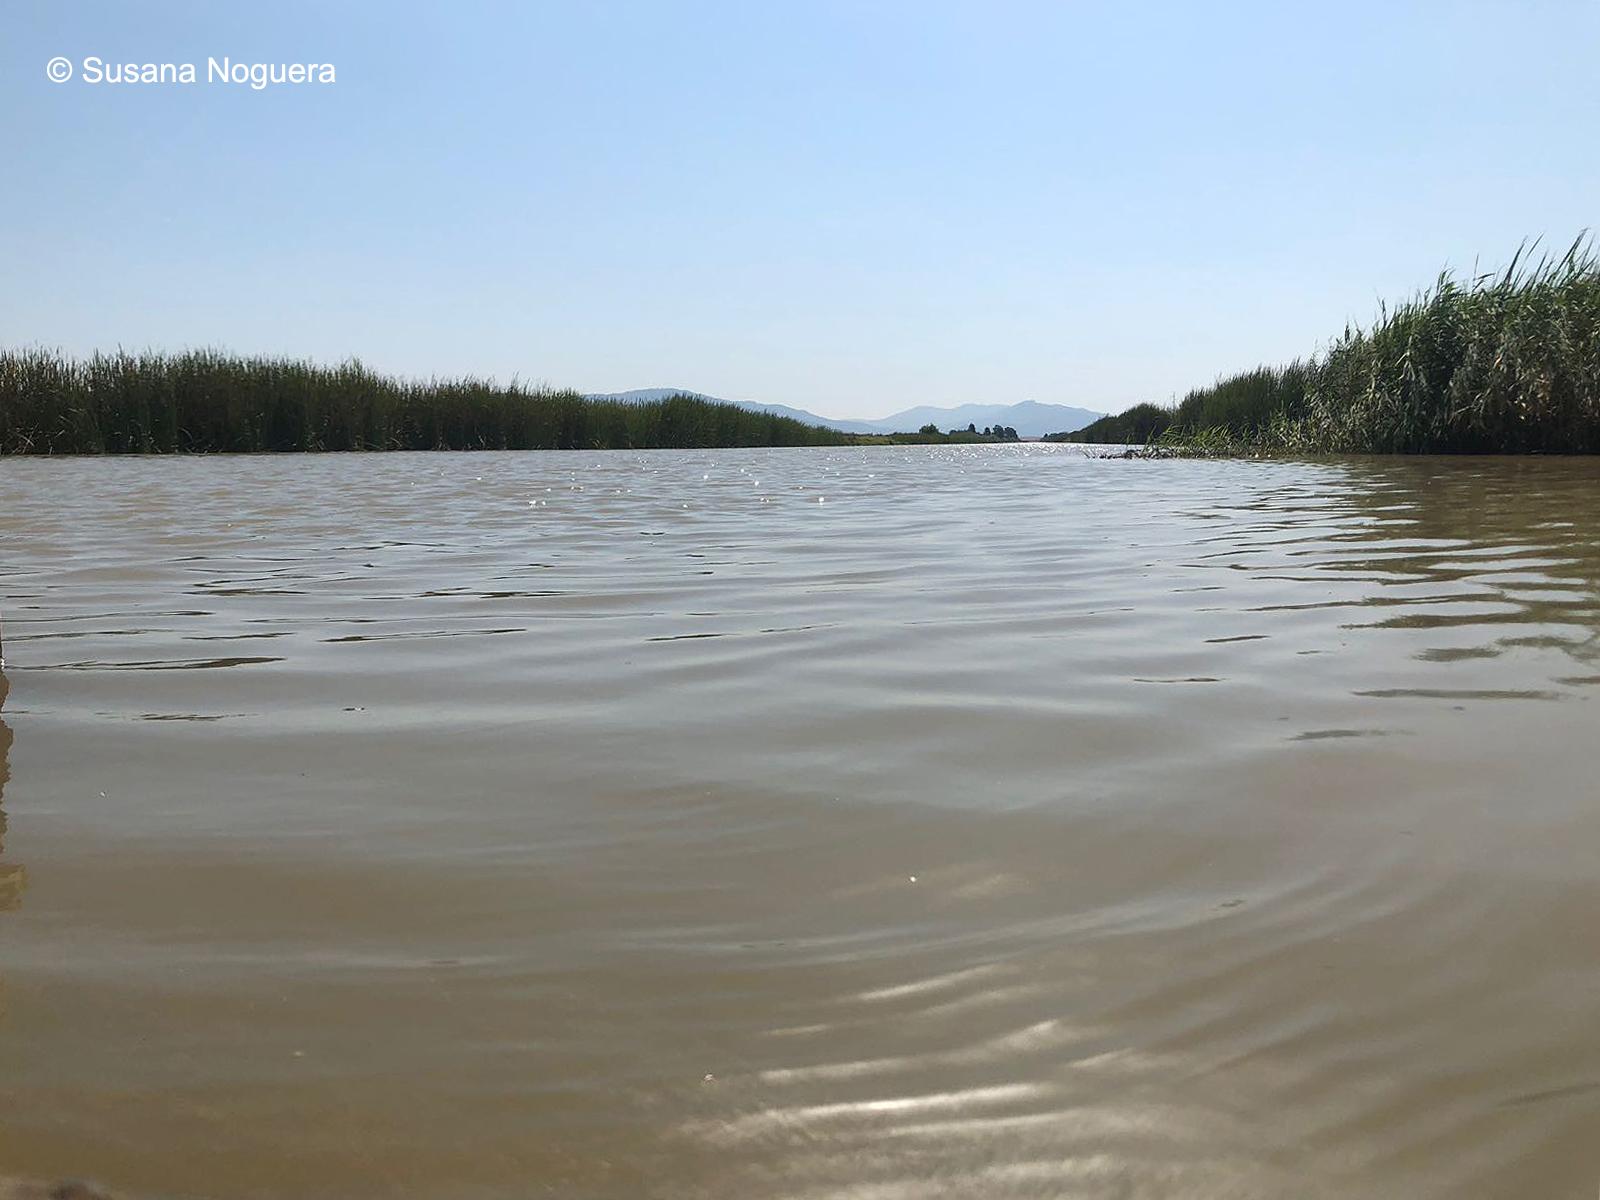 Canal de la zona de La Janda. Imagen: Susana Noguera